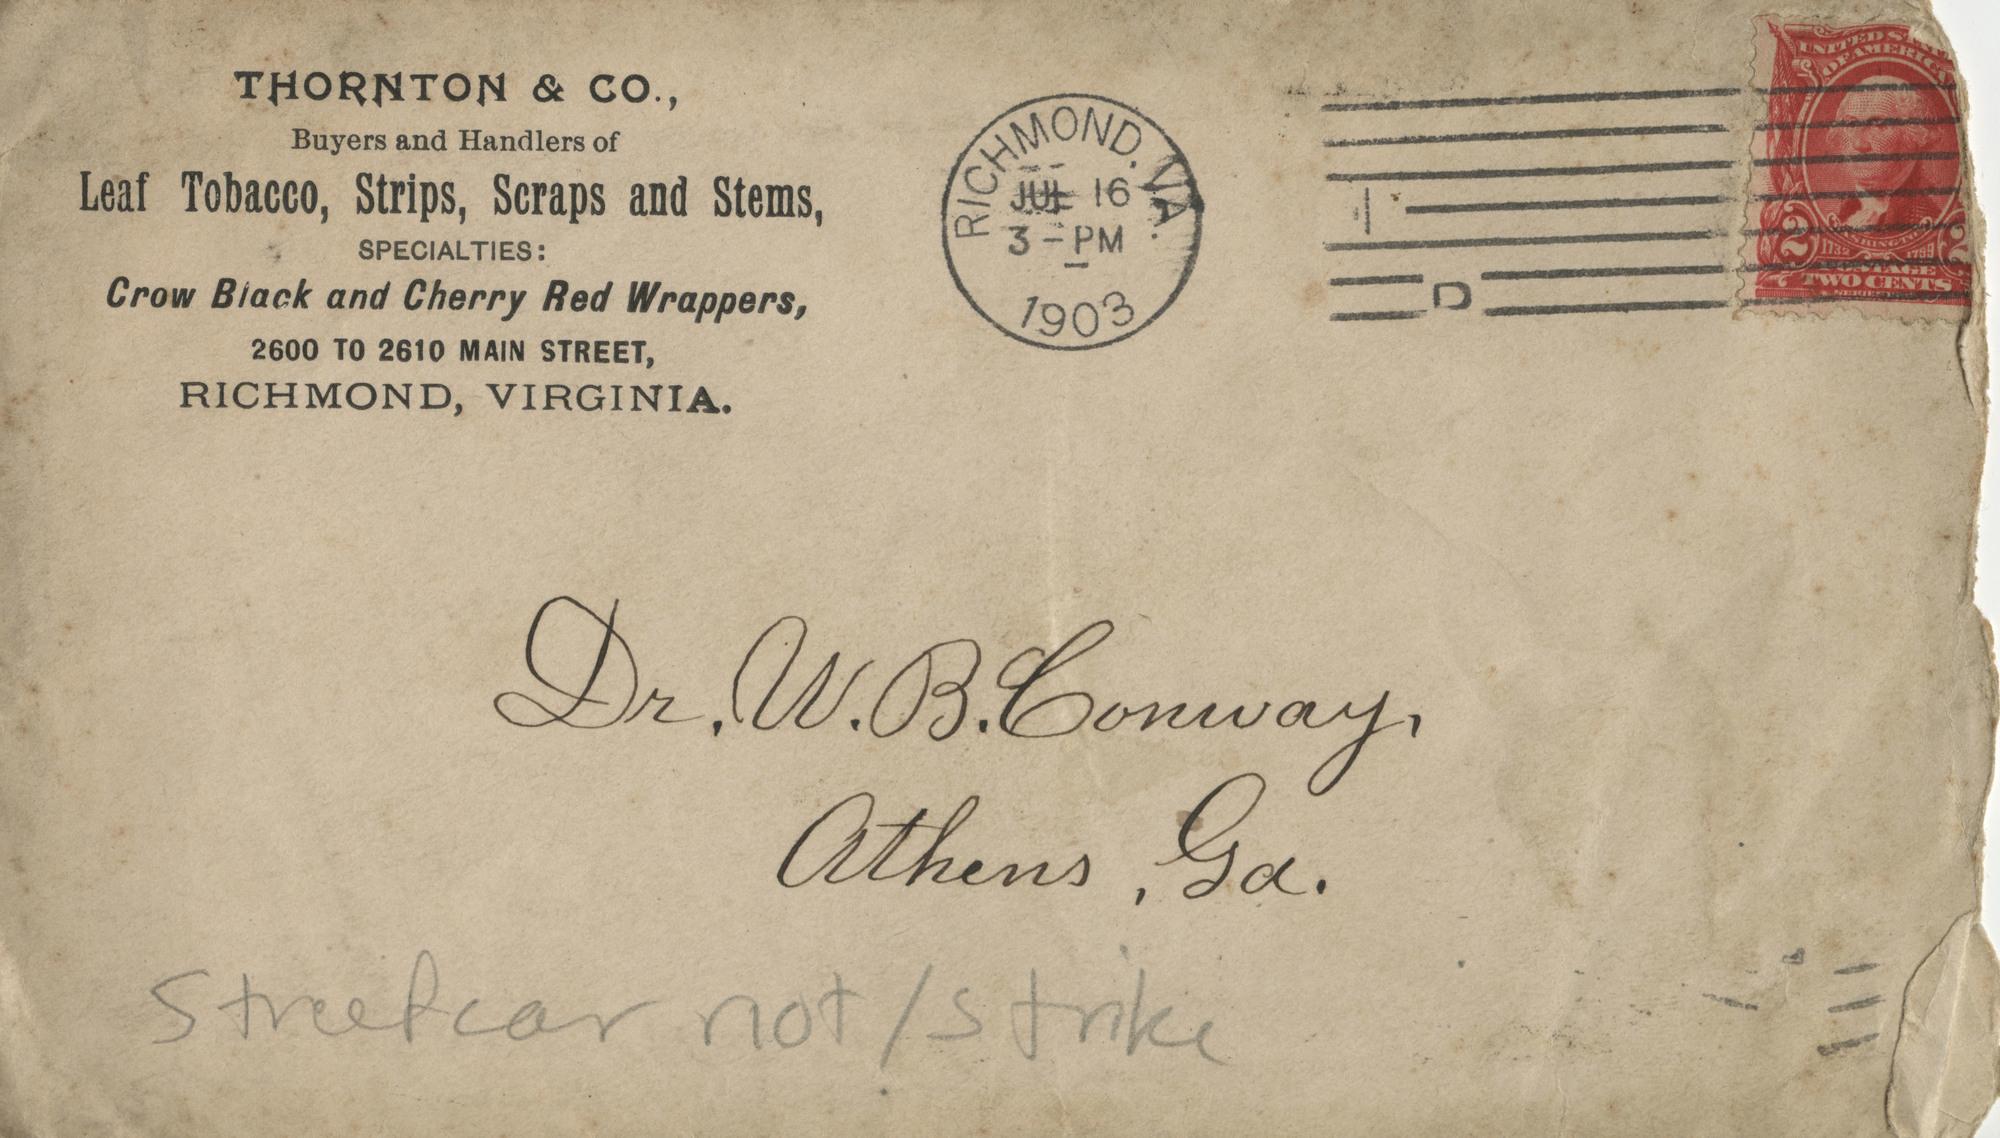 http://spec.lib.vt.edu/pickup/Omeka_upload/Ms2012-039_ConwayCatlett_F4_Letter_1903_0716_enva.jpg